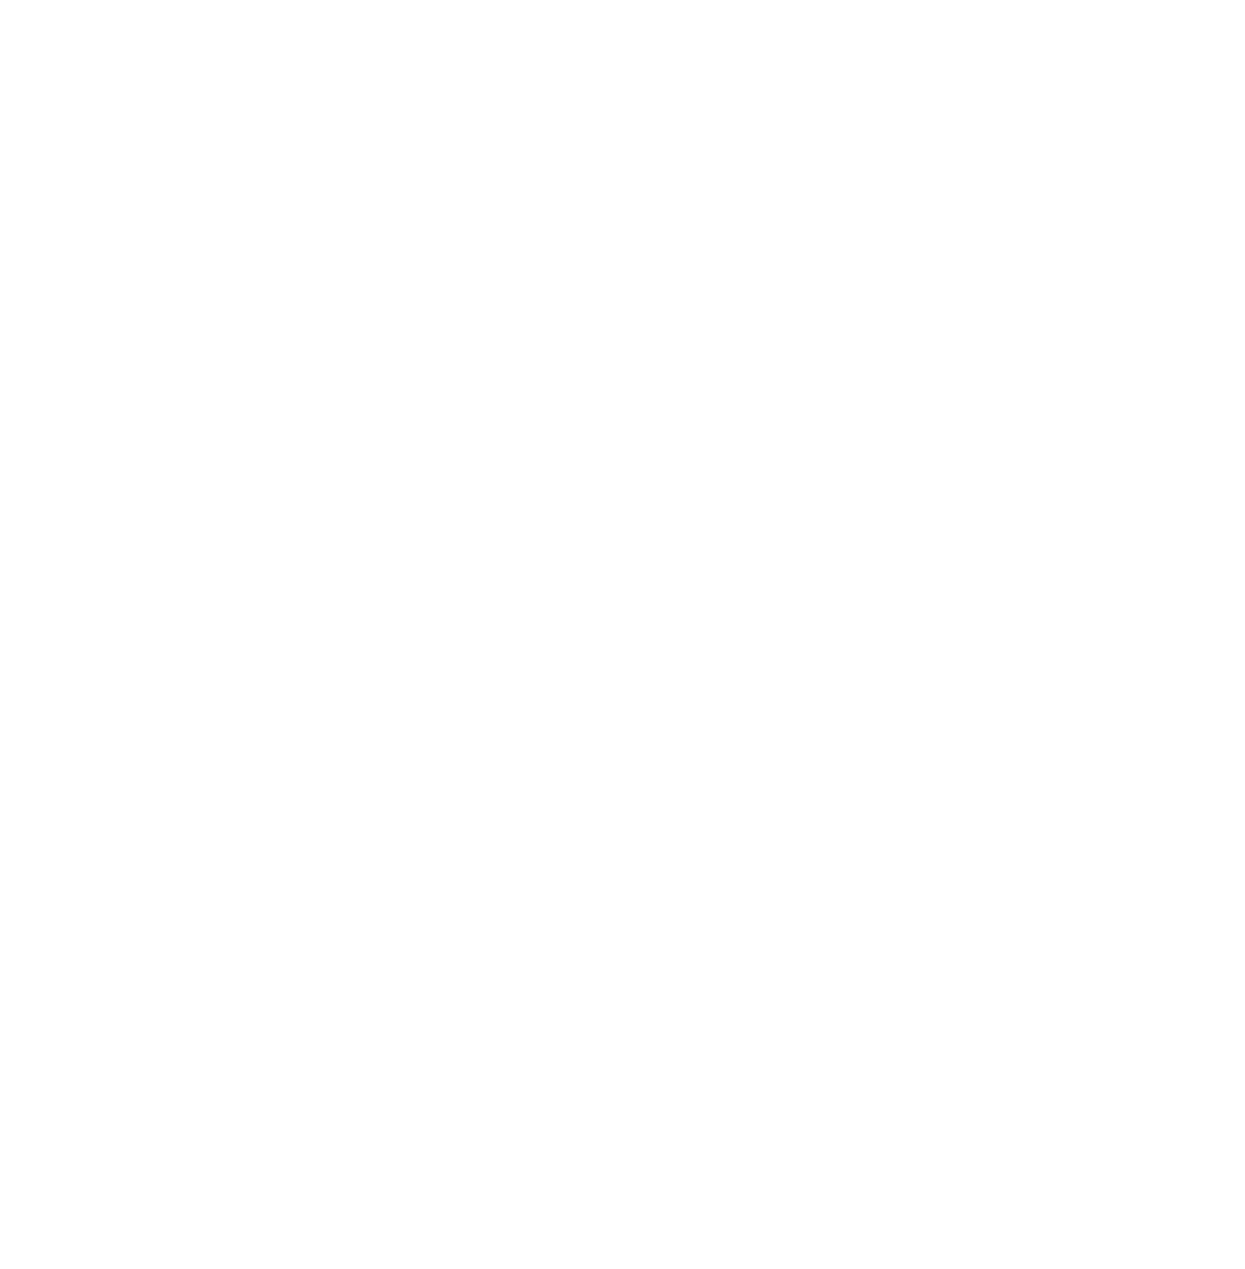 831x – 15